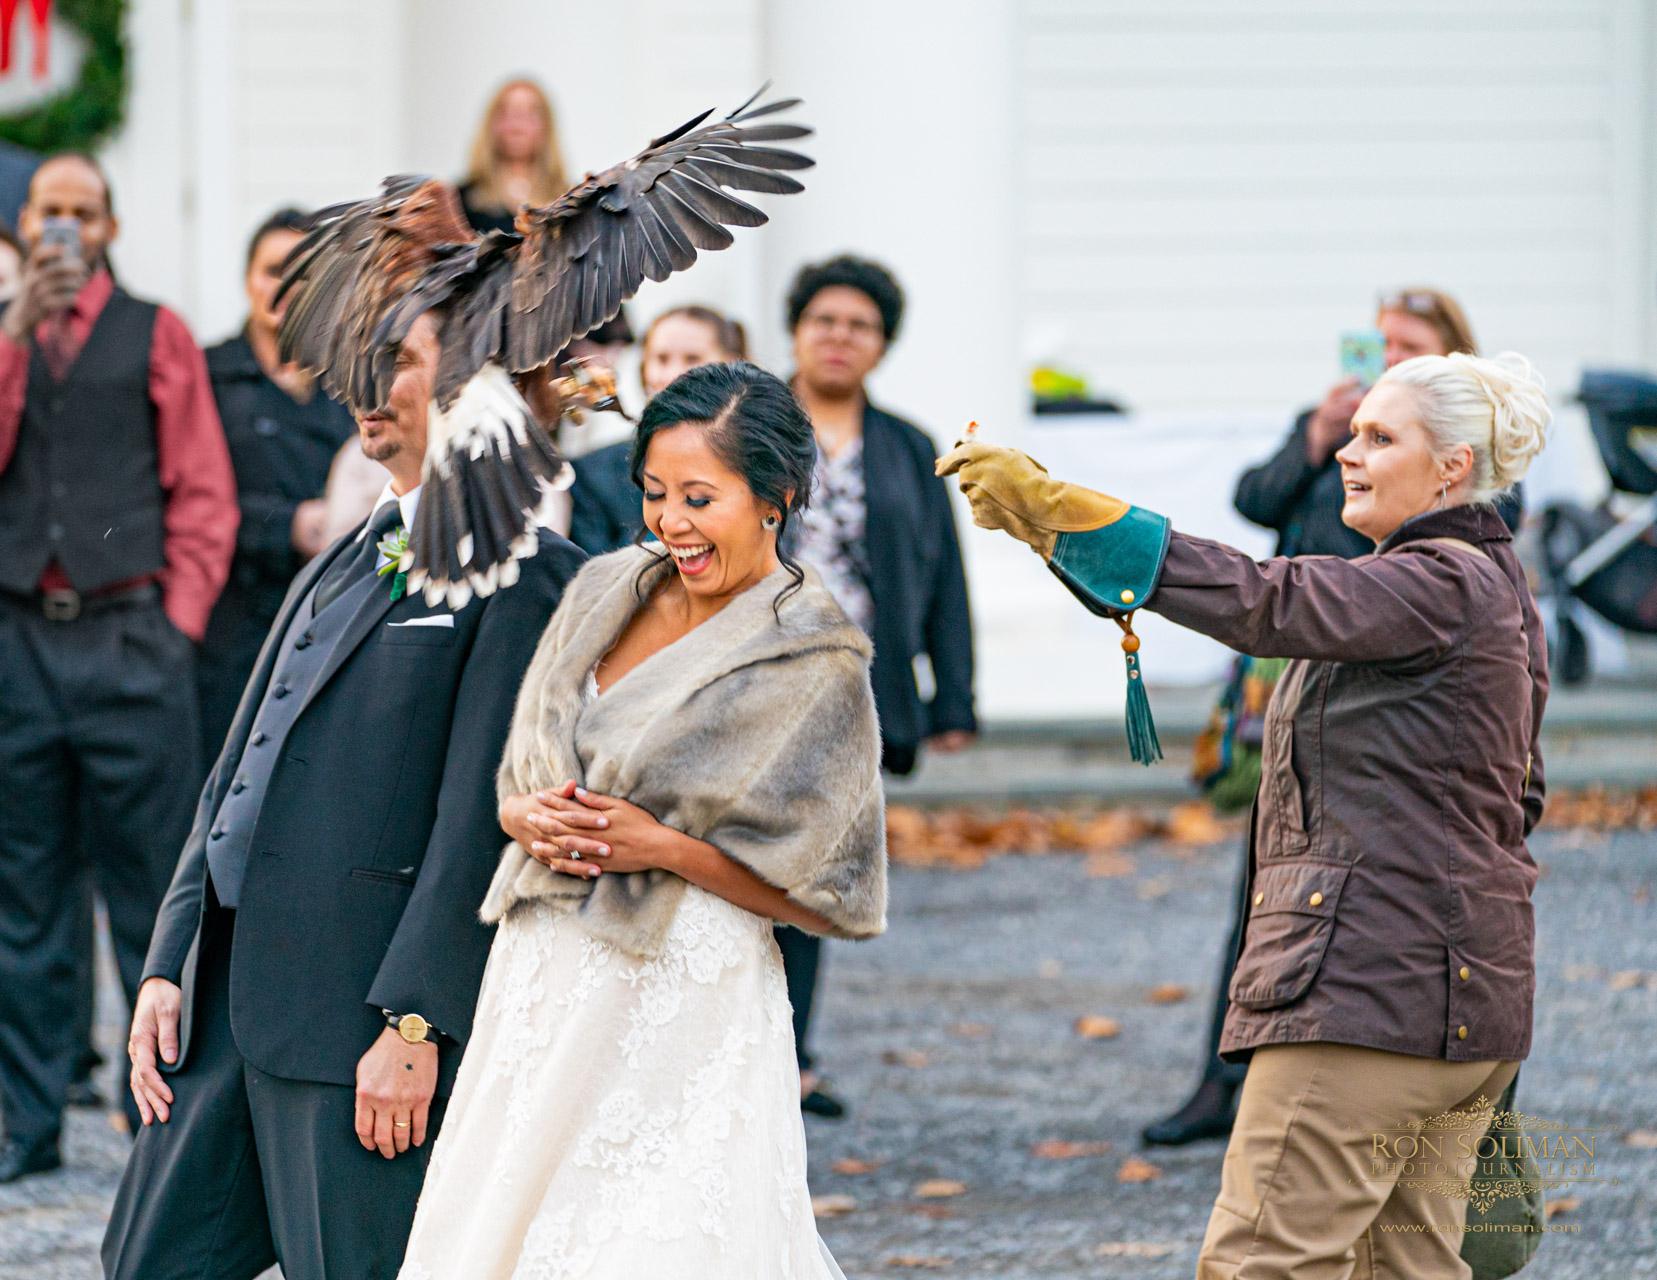 THE GREENBRIER RESORT WEDDING 40